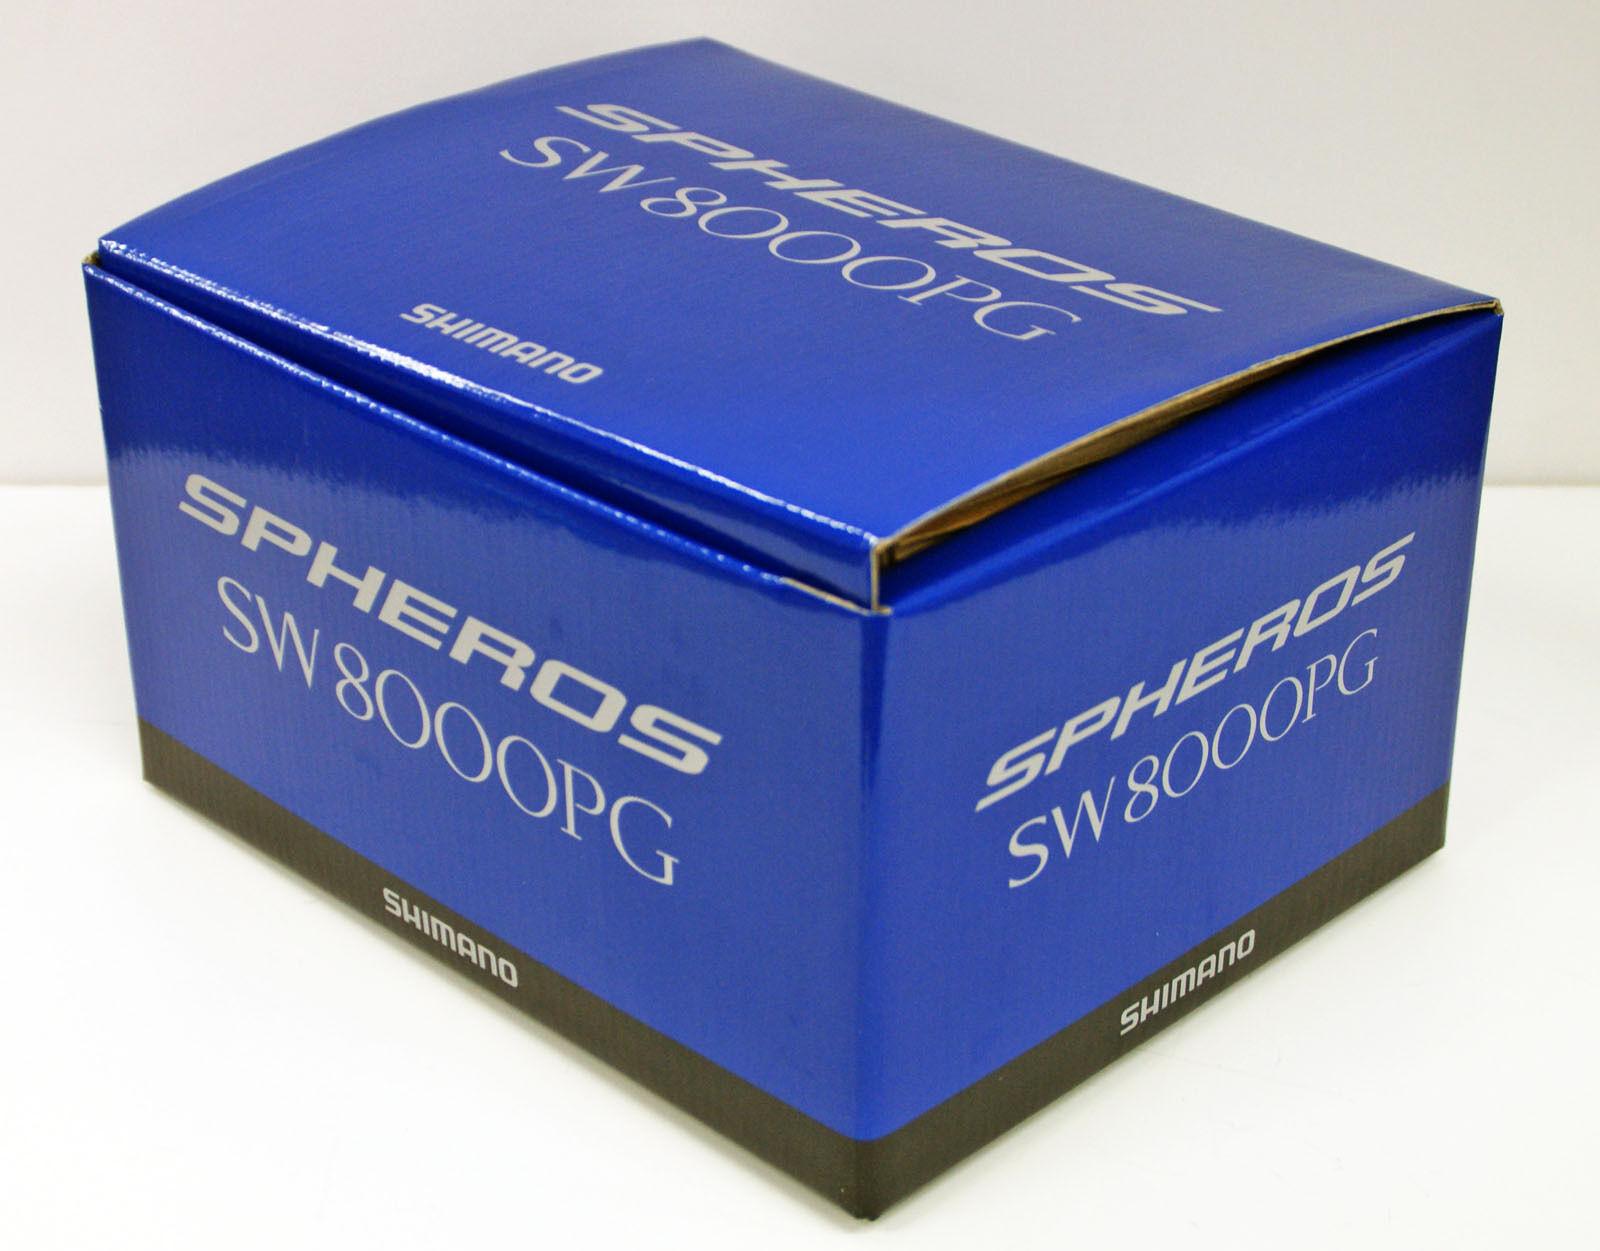 Shimano 14 Spheros SW 8000PG Saltwater Spinning Spinning Saltwater Reel 4969363032799 fa1c0d